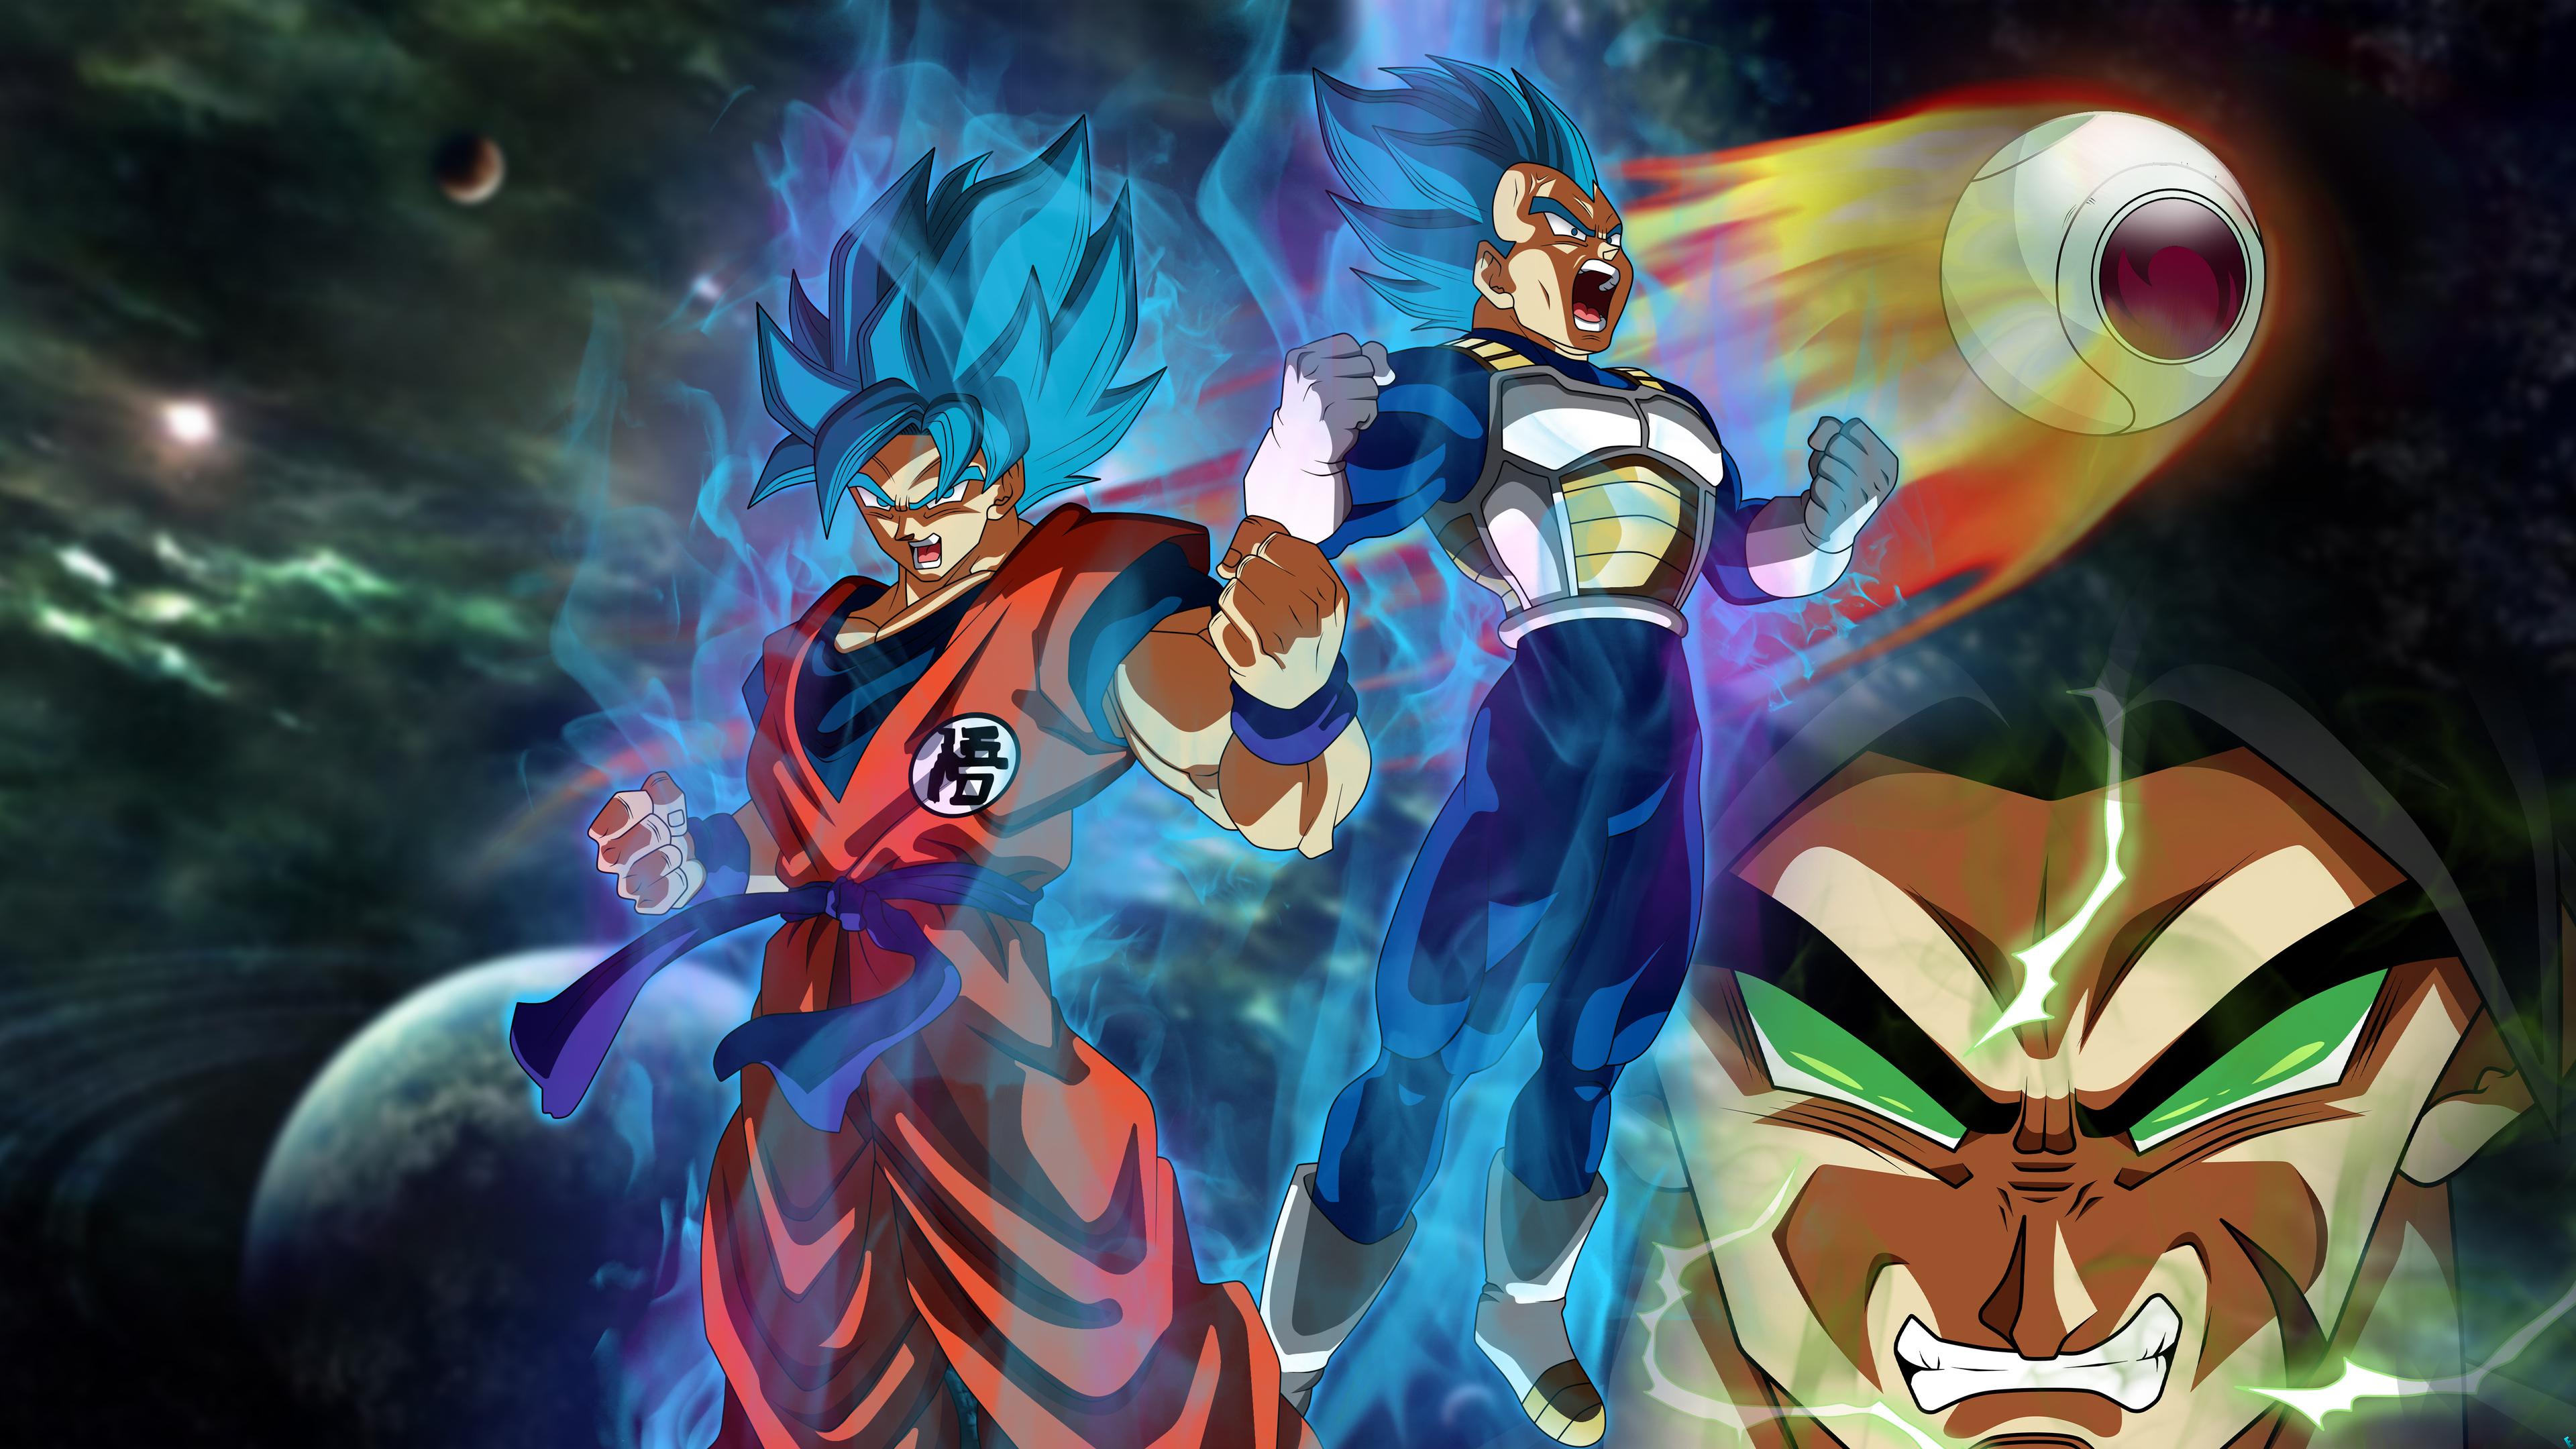 3840x2160 Goku Vegeta Dragon Ball Super 5k 4k Hd 4k Wallpapers